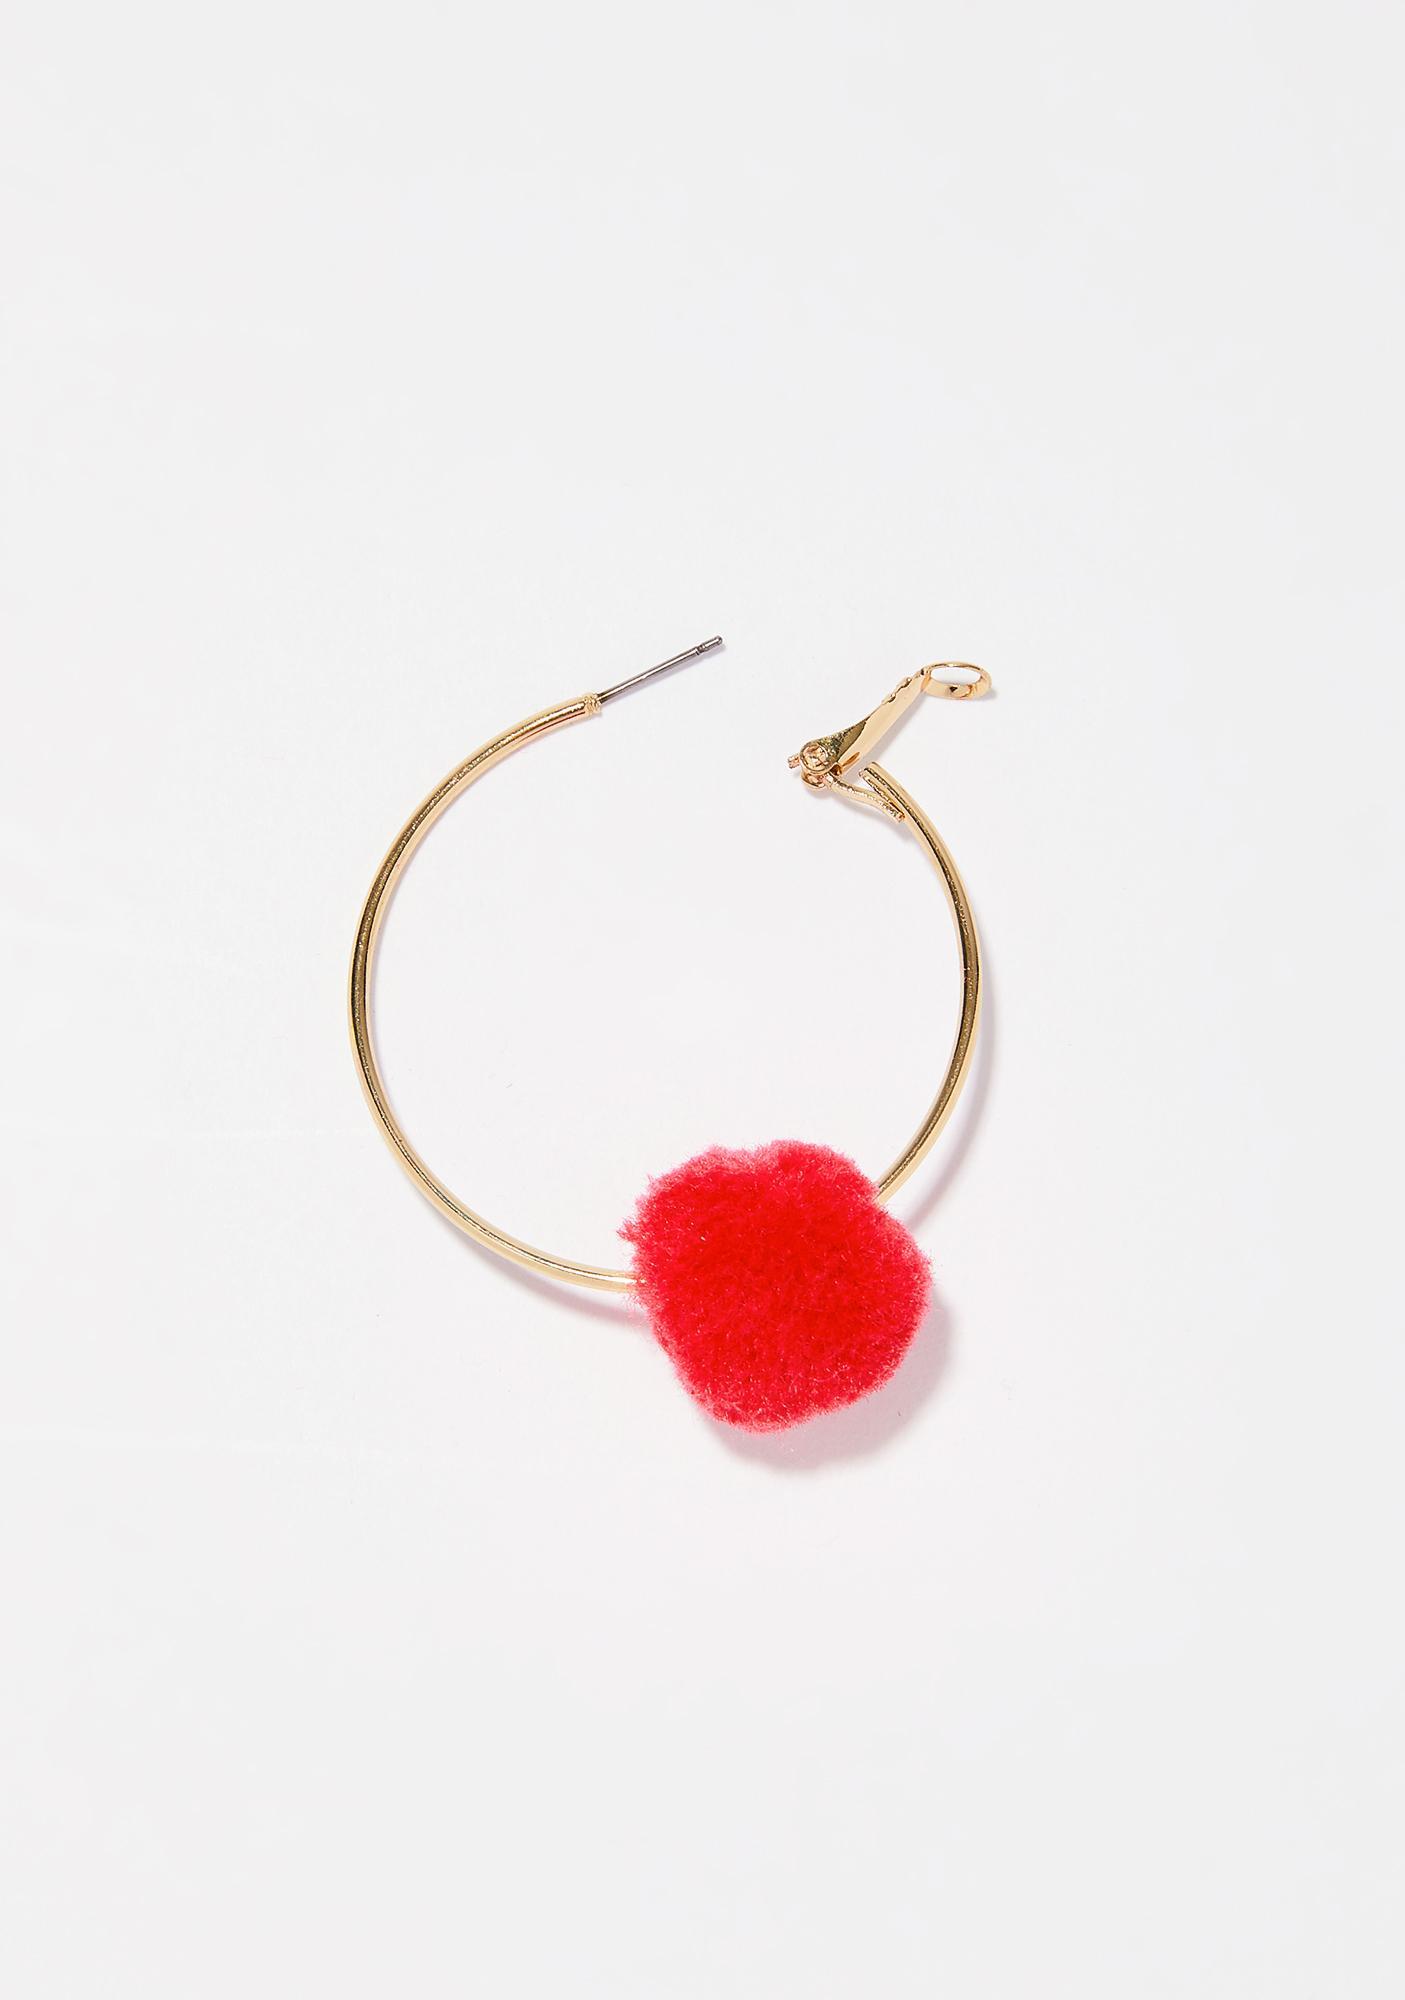 Heart Lil' Fluff Ball Earrings